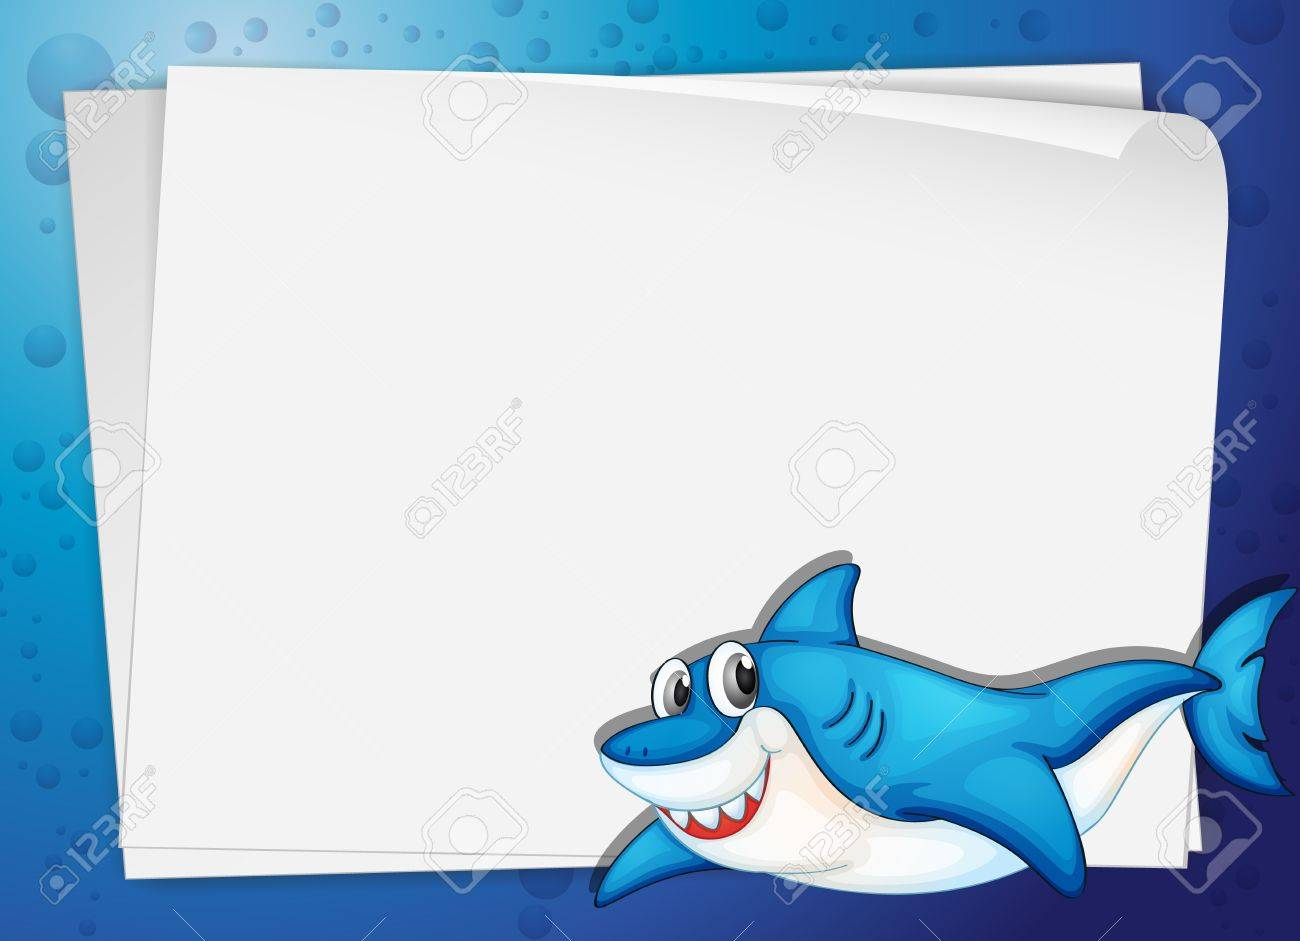 cartoon paper template of a shark royalty cliparts vectors  cartoon paper template of a shark stock vector 13700041